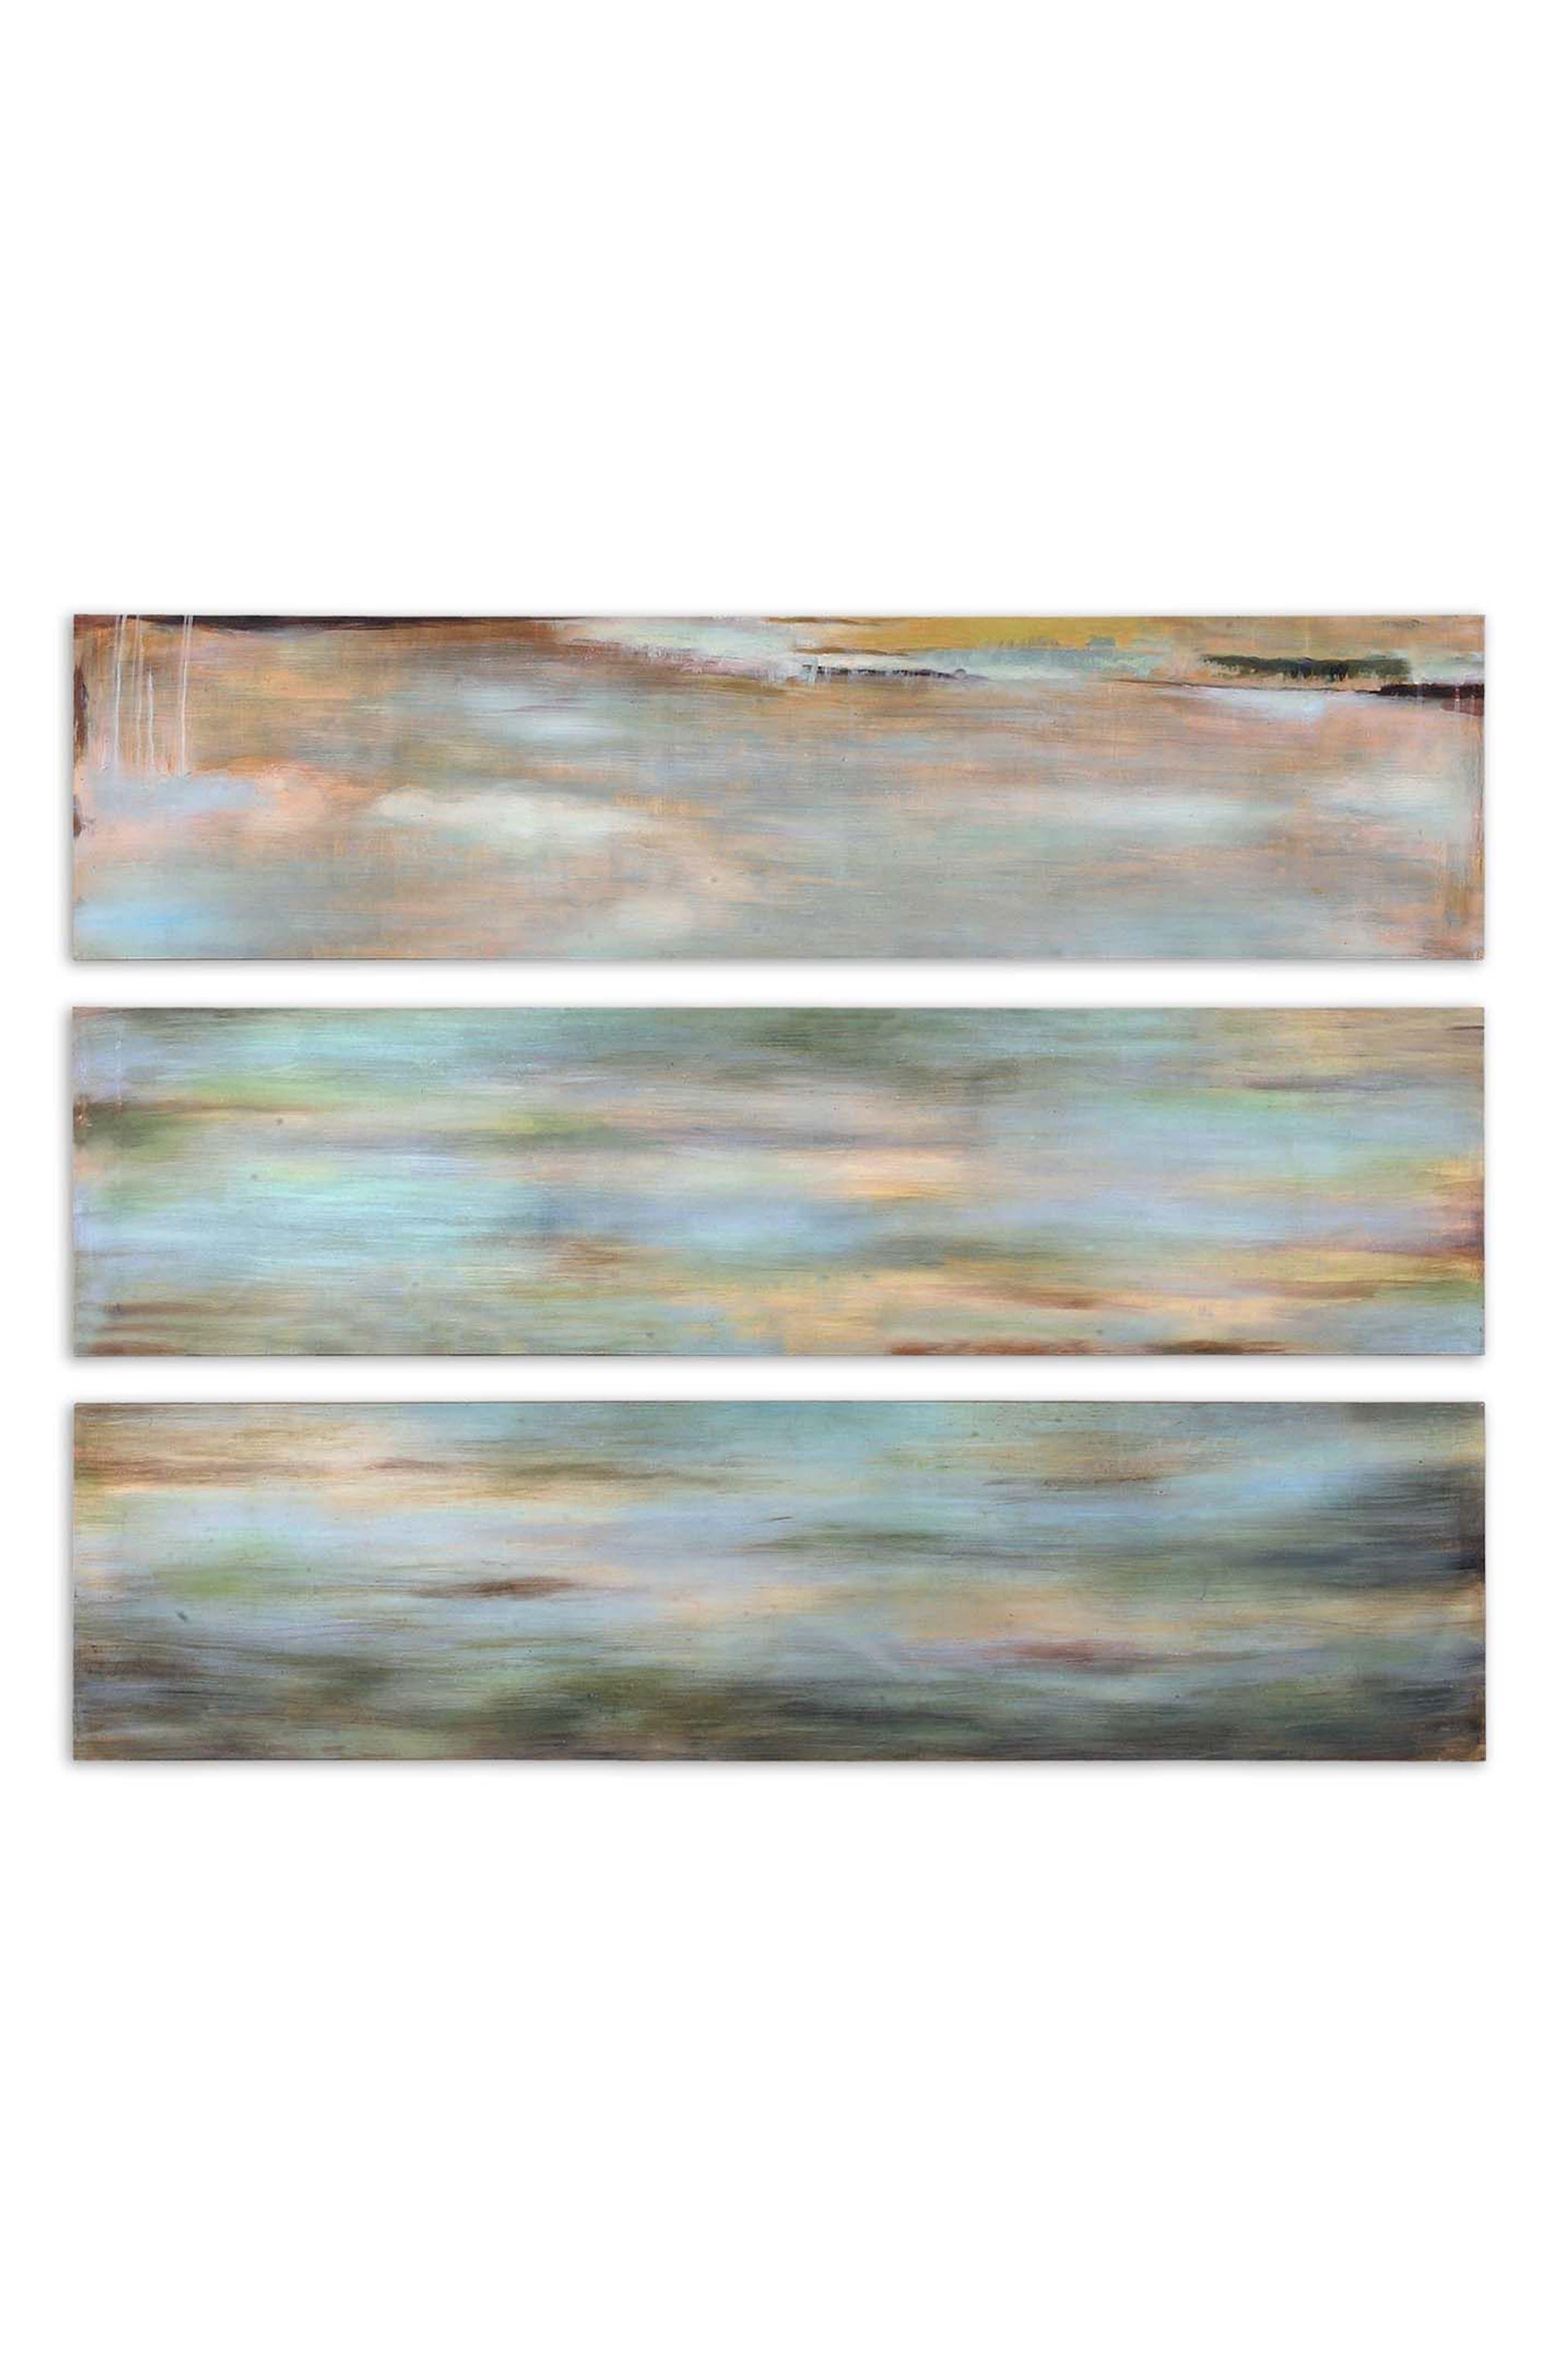 Alternate Image 1 Selected - Uttermost Horizon View 3-Panel Wall Art